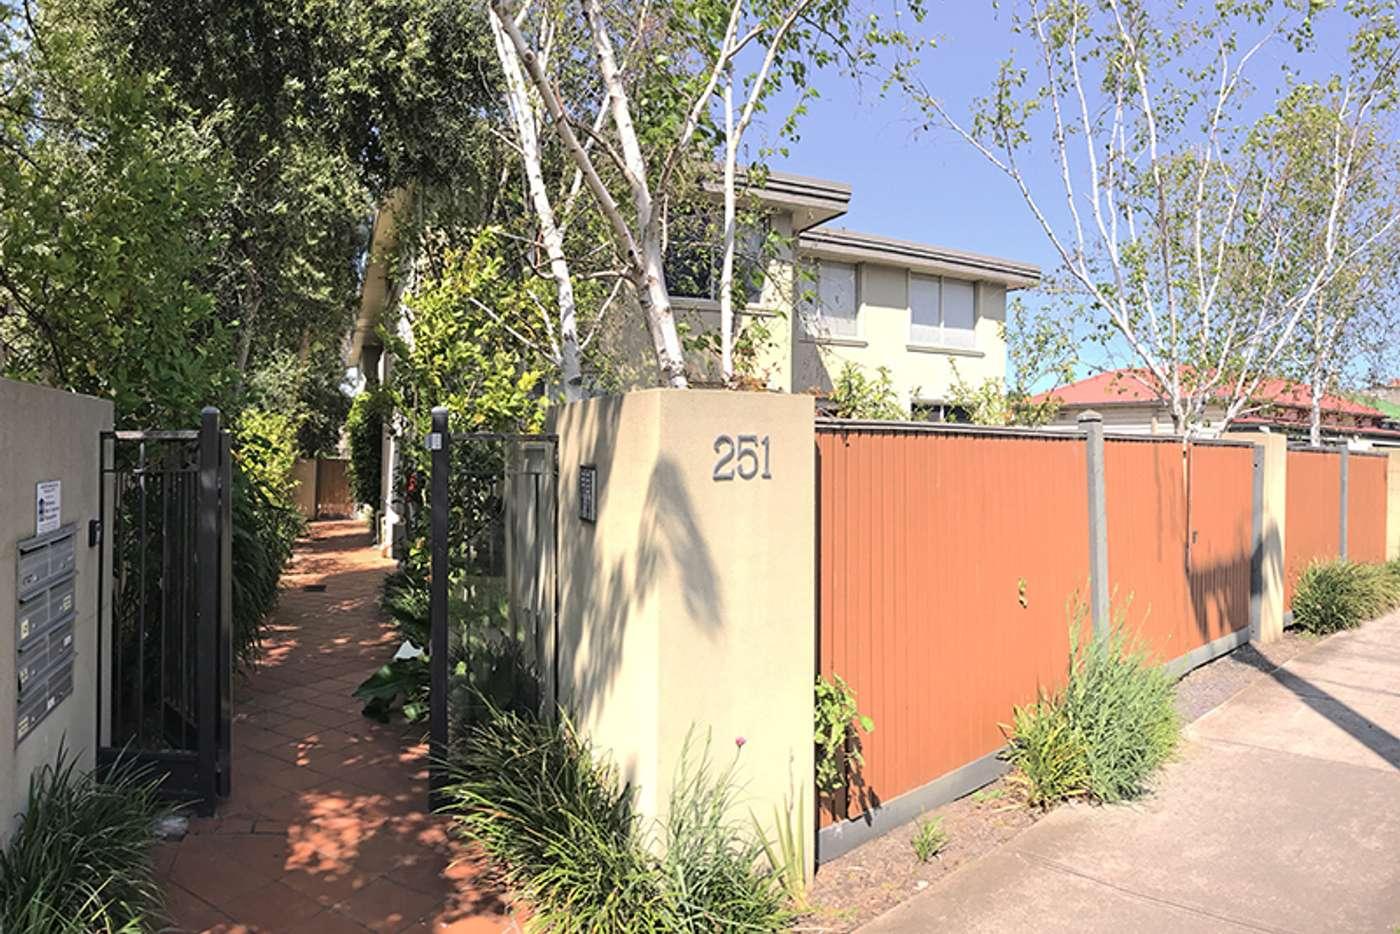 Main view of Homely apartment listing, 7/251 Nicholson Street, Seddon VIC 3011